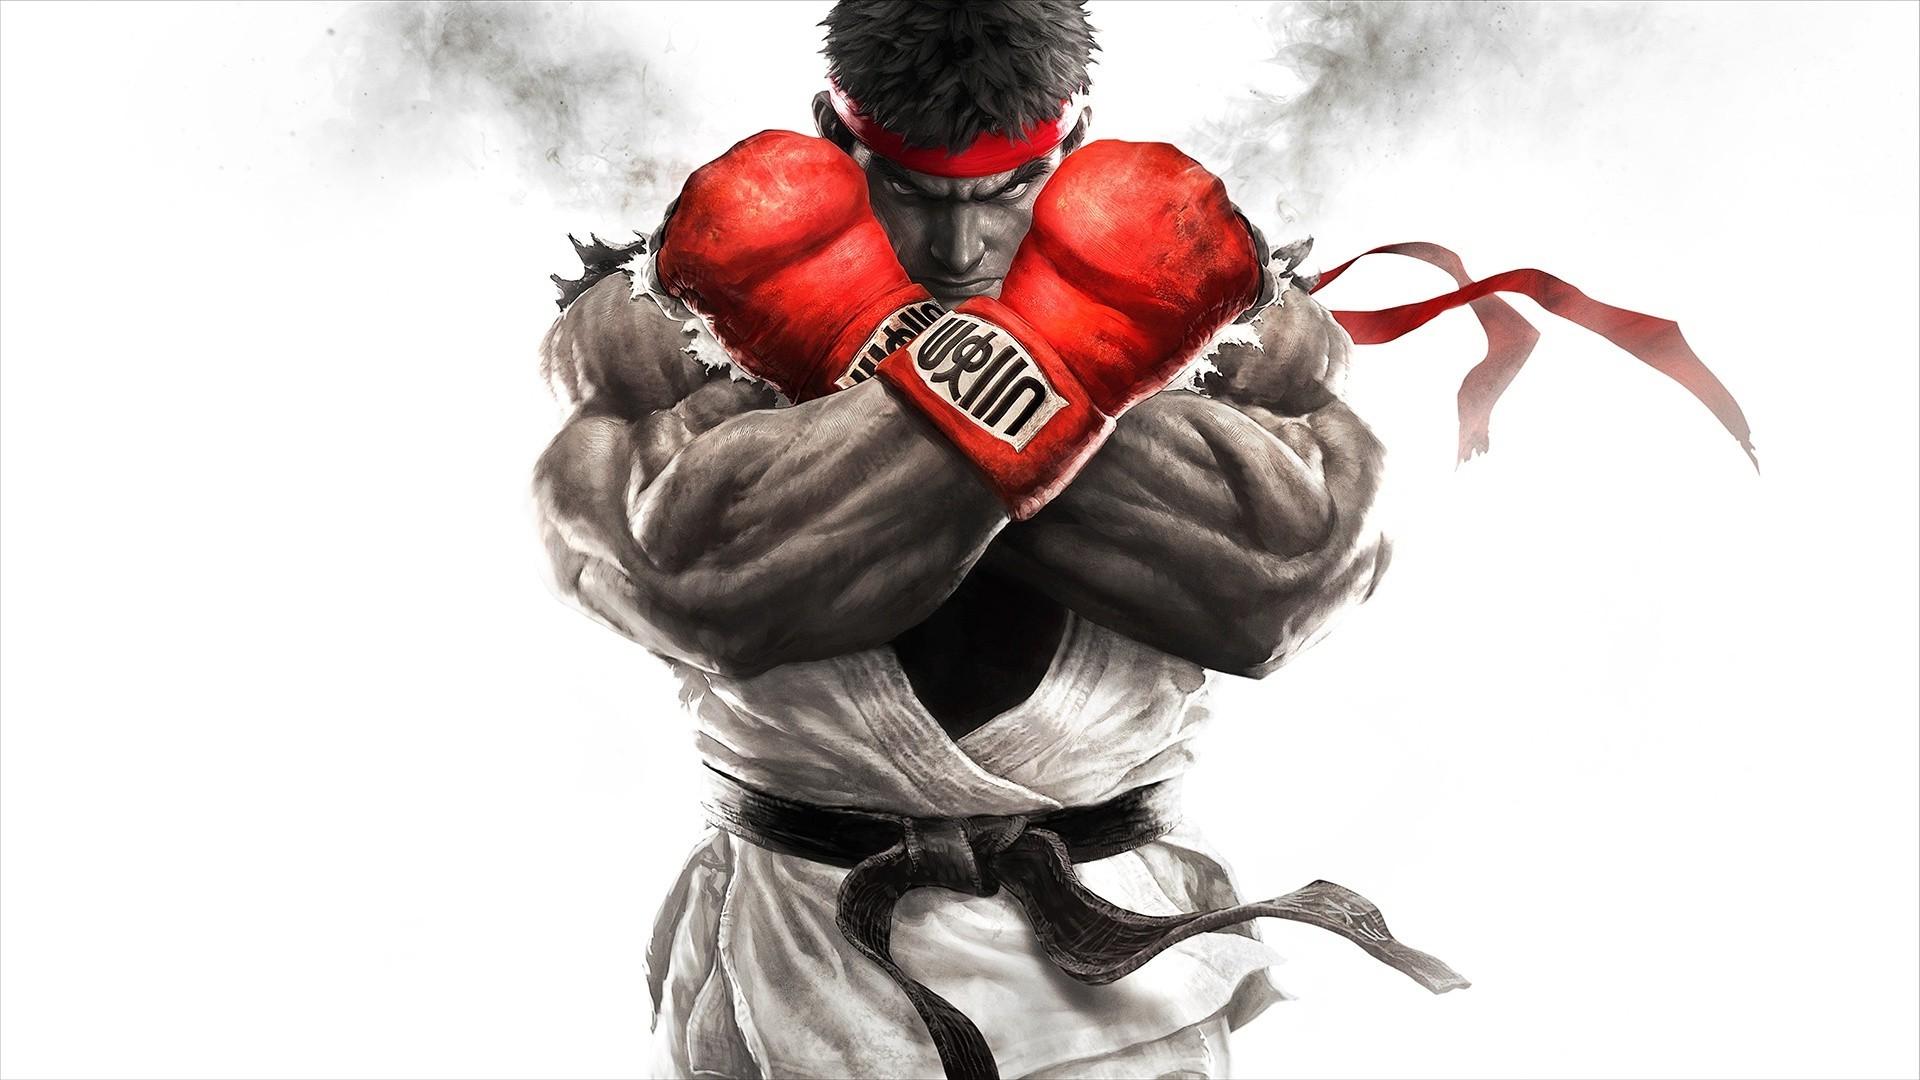 street fighter chun-li HD | HD Wallpapers | Pinterest | Chun li, Street  fighter and Video games